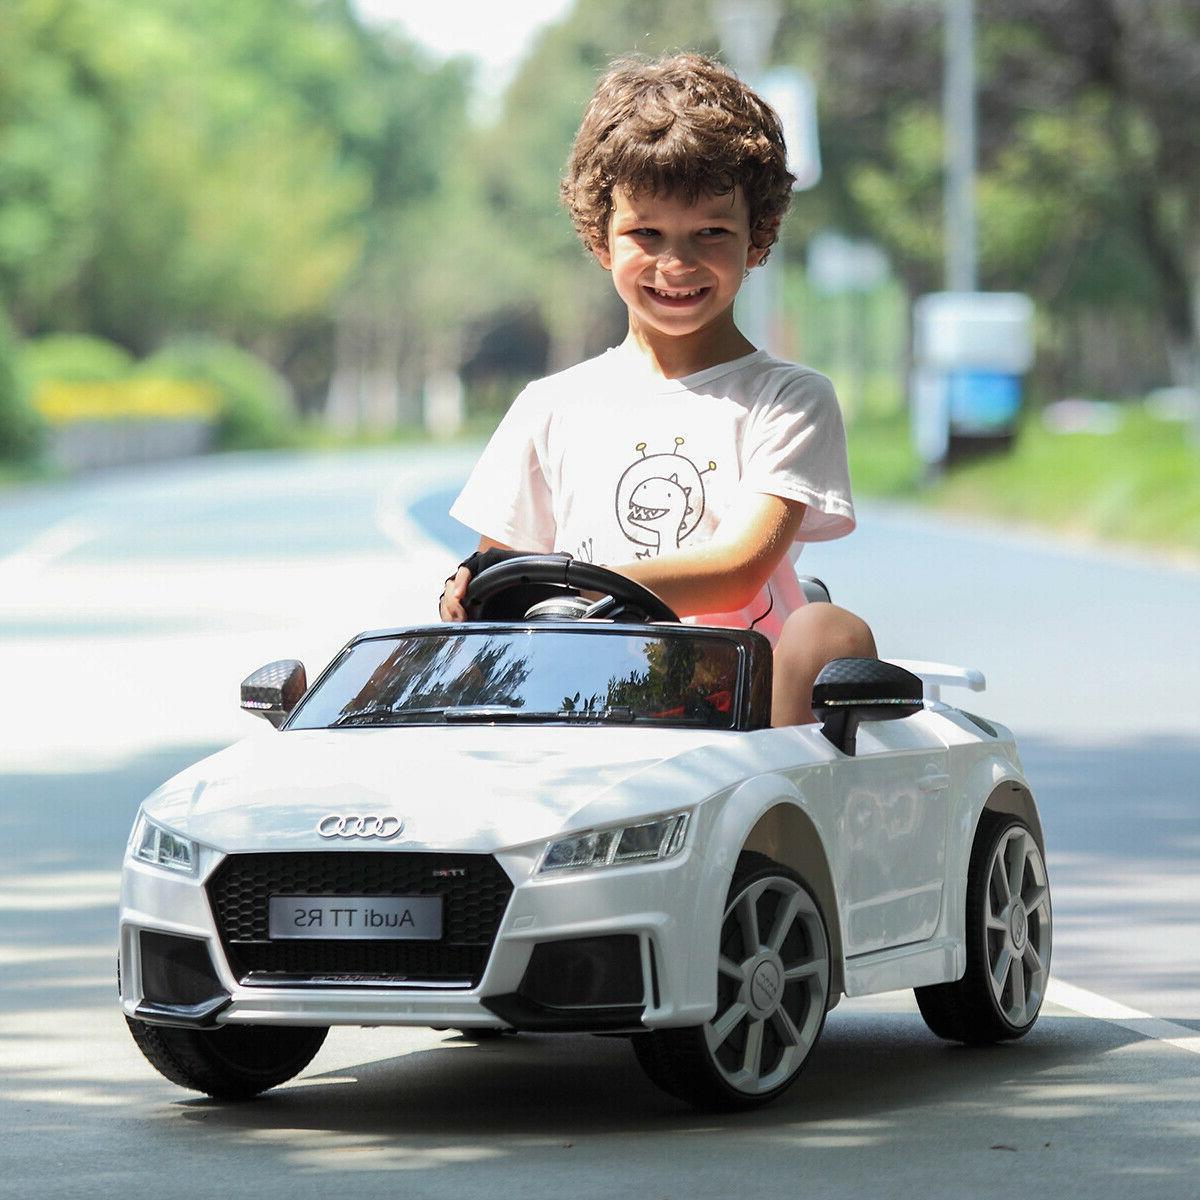 Audi TT RS Ride Electric Licensed R/C Remote Control